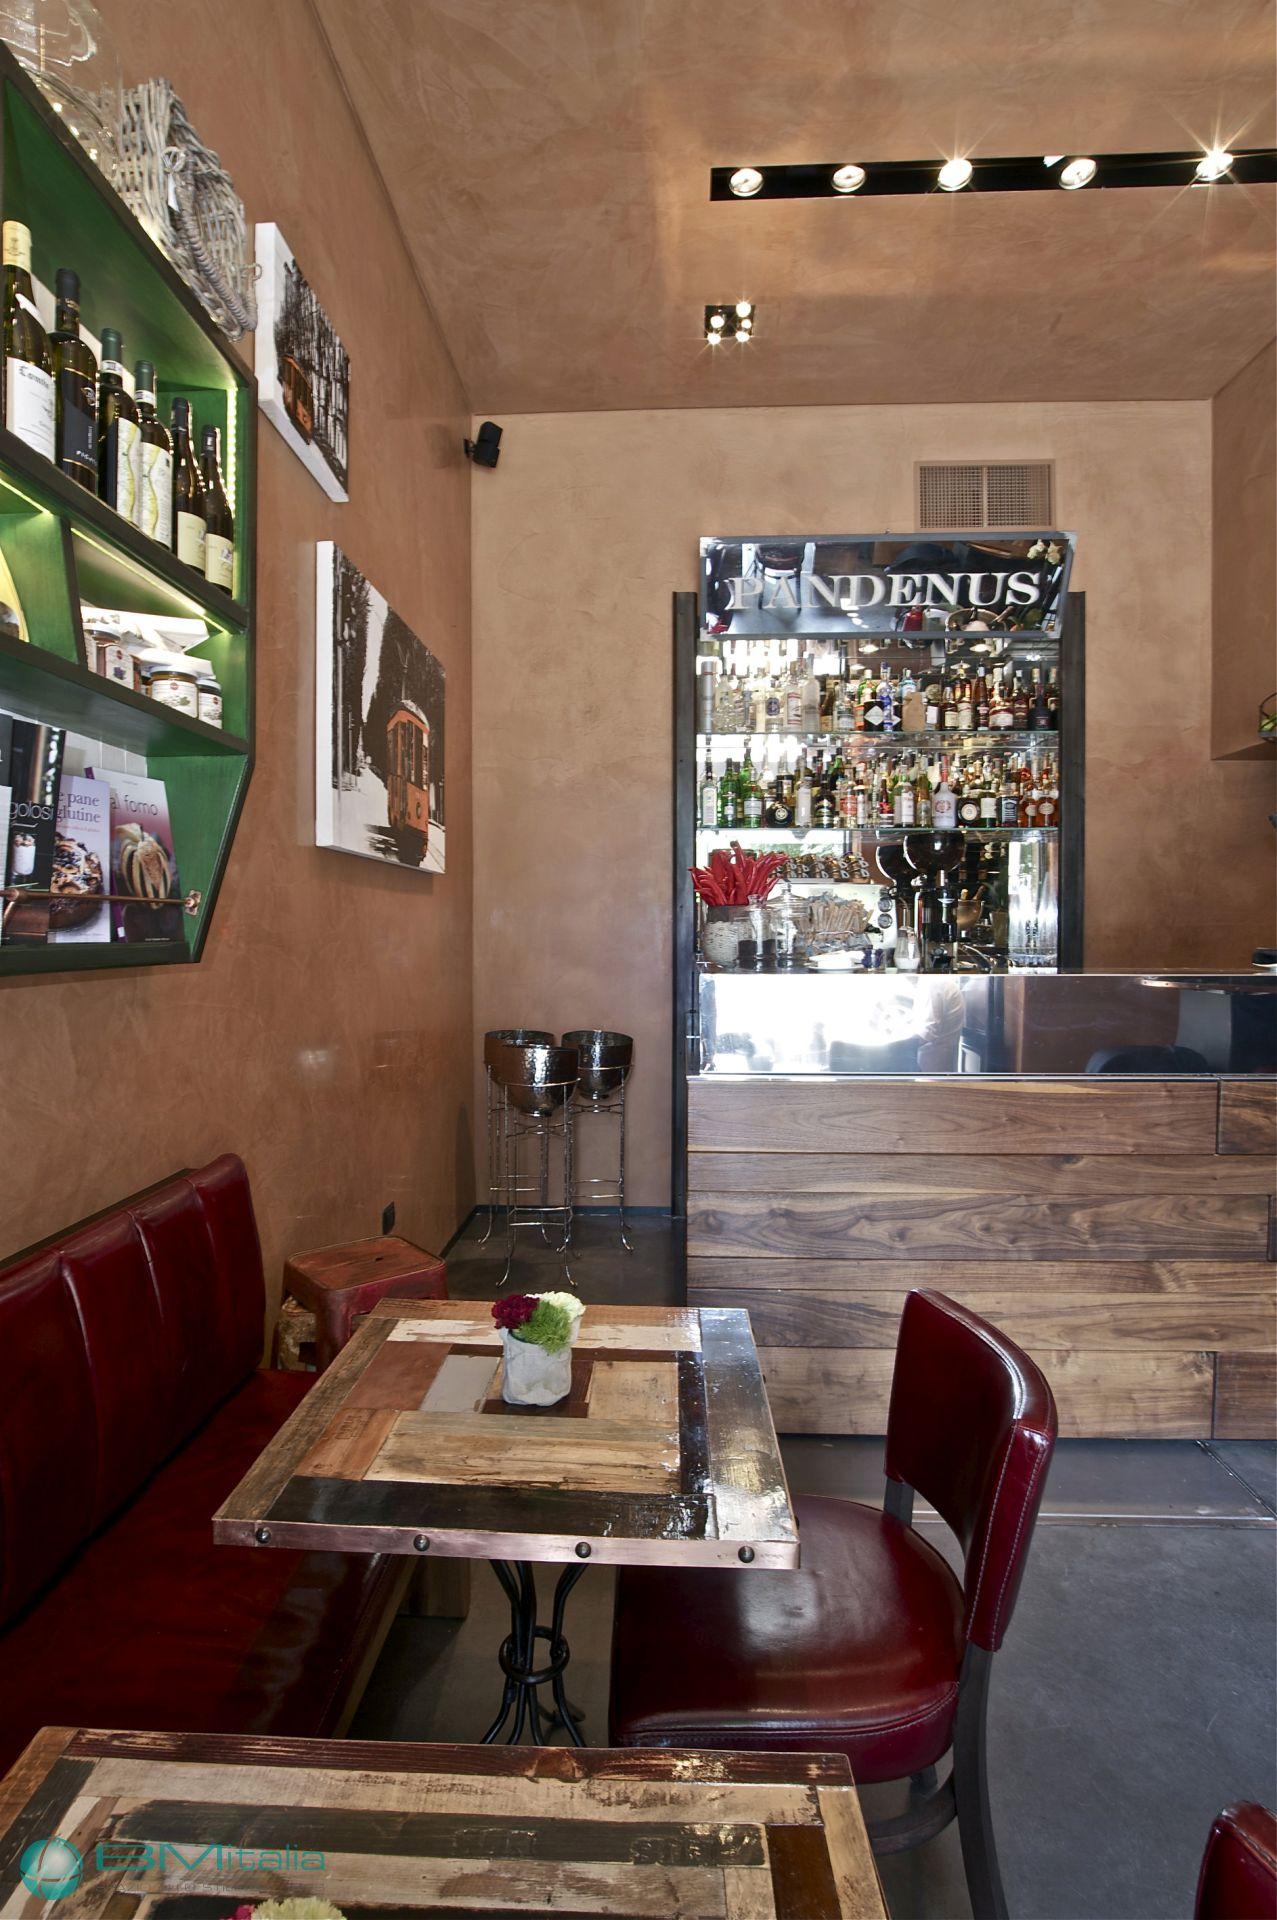 Arredamenti per bakery panifici franchising bar for Arredamenti per panifici